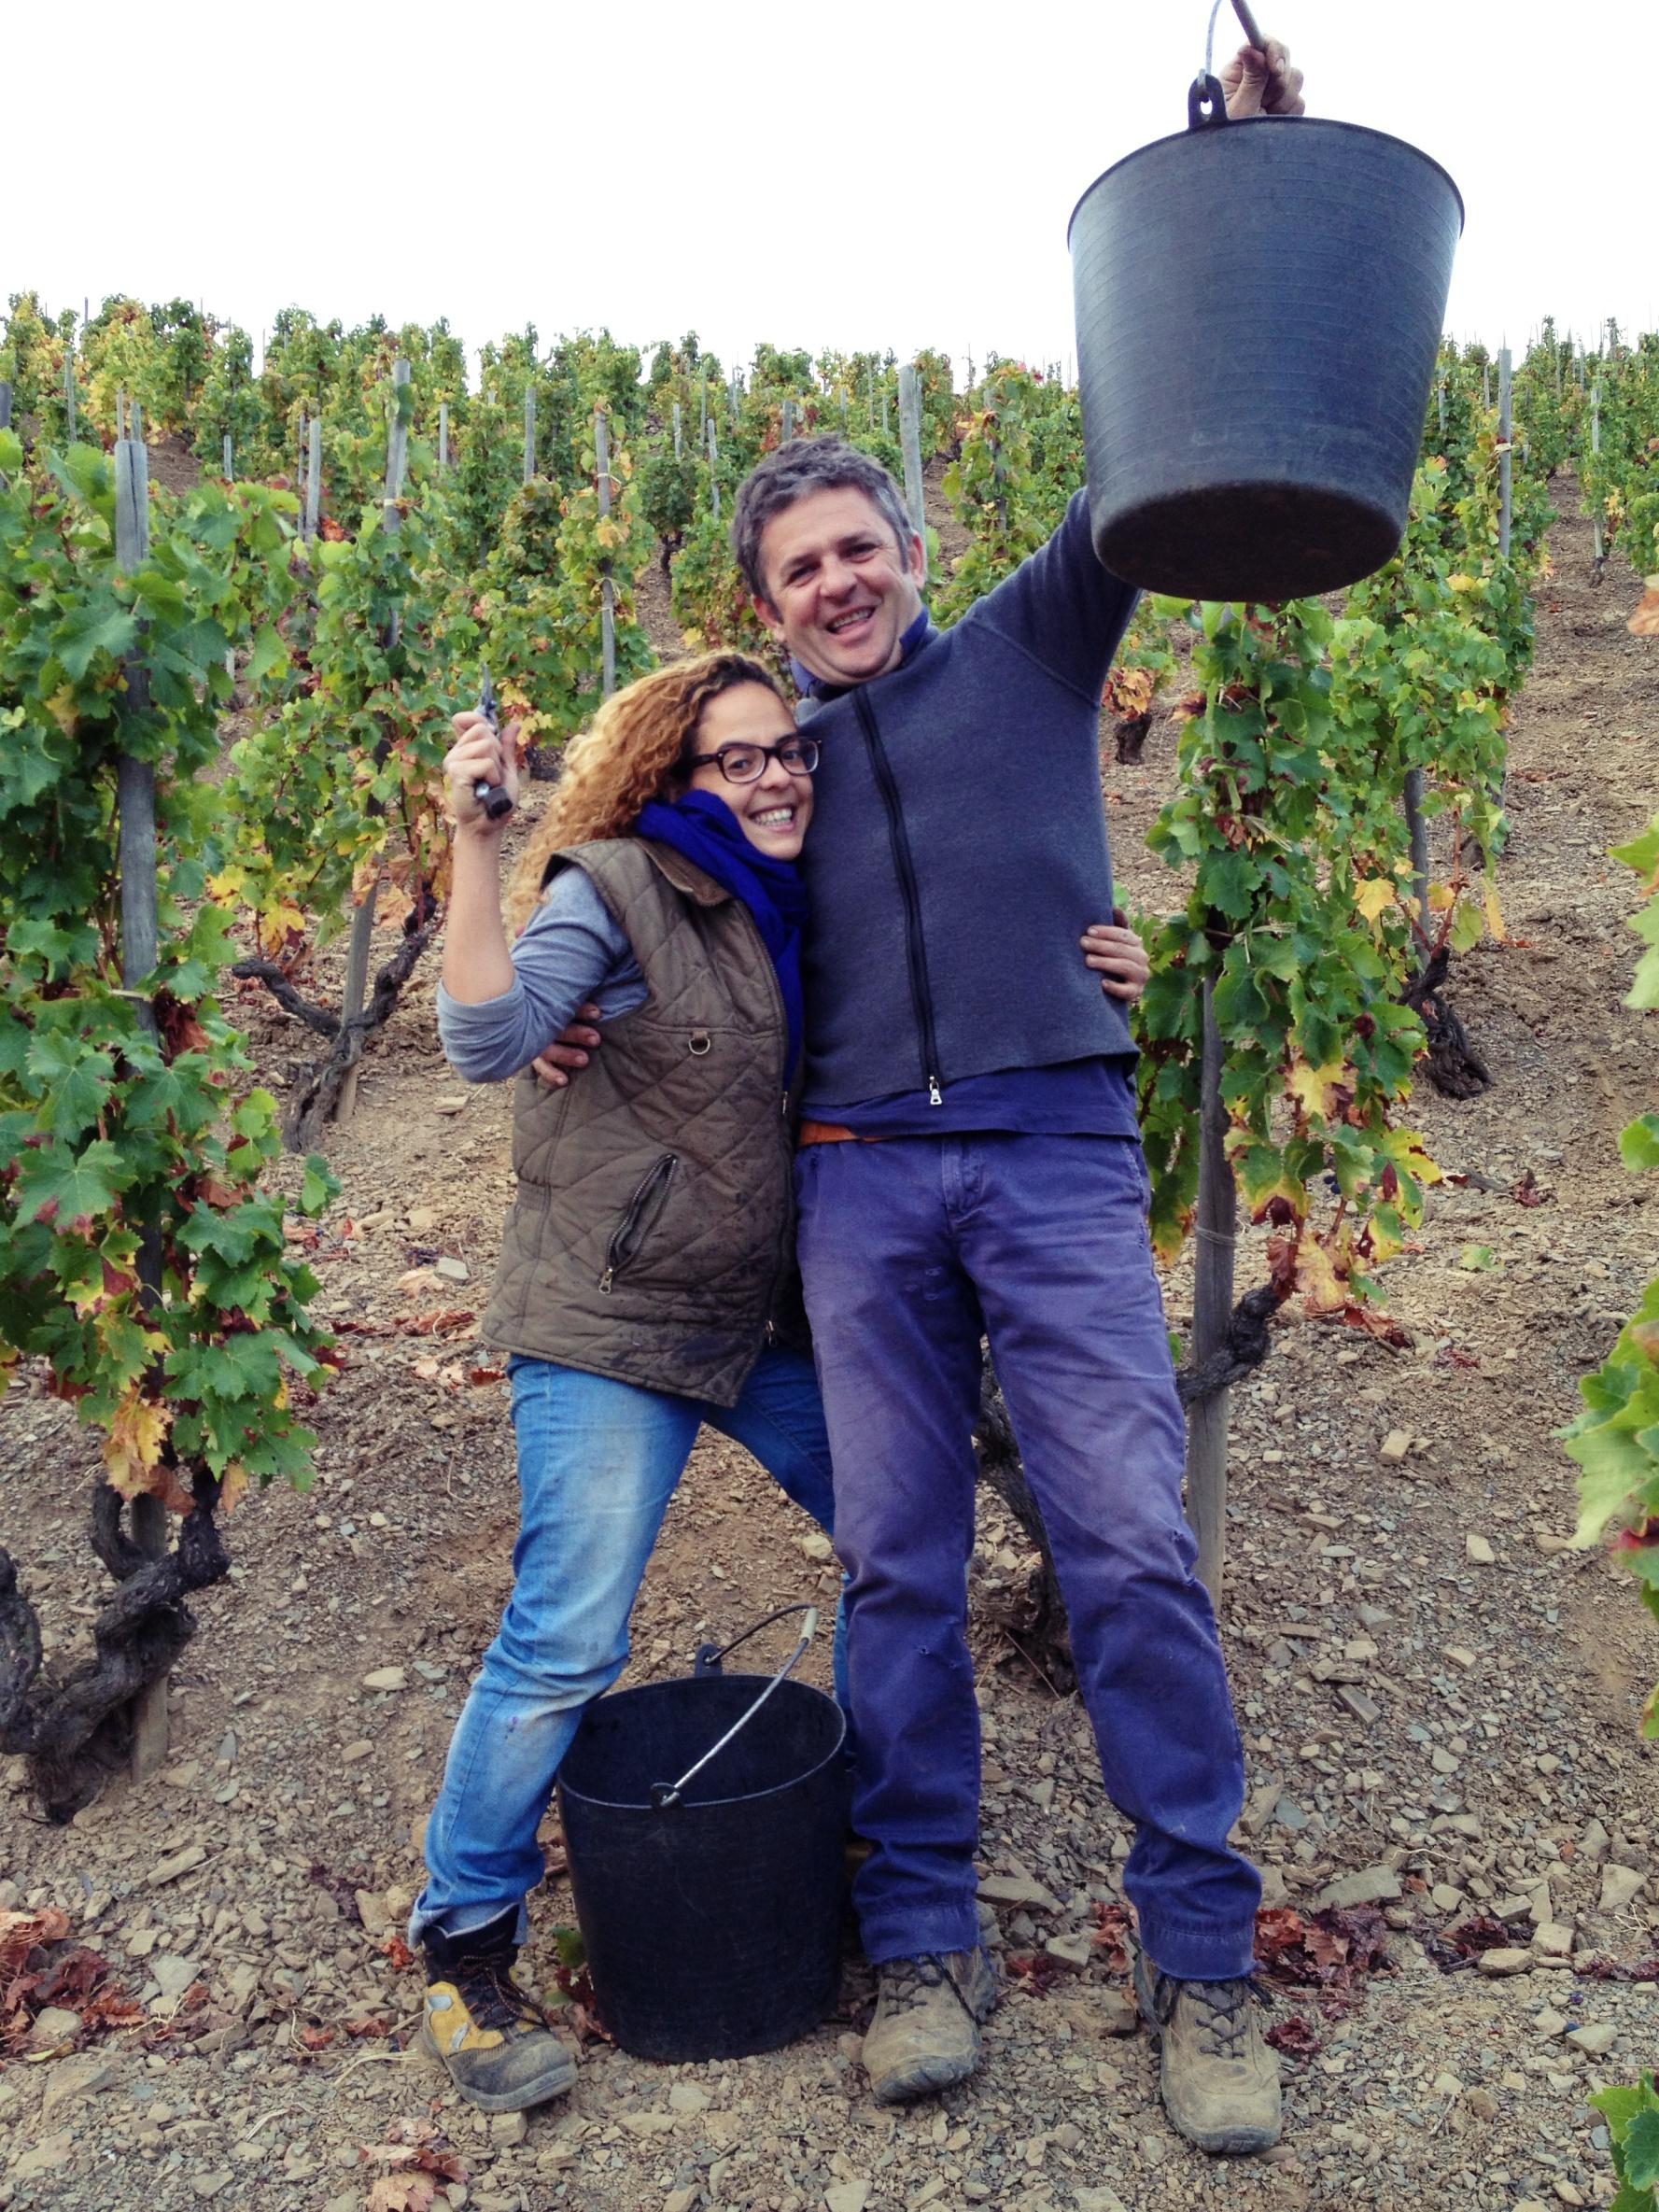 palacios-vineyard-harvest-0817